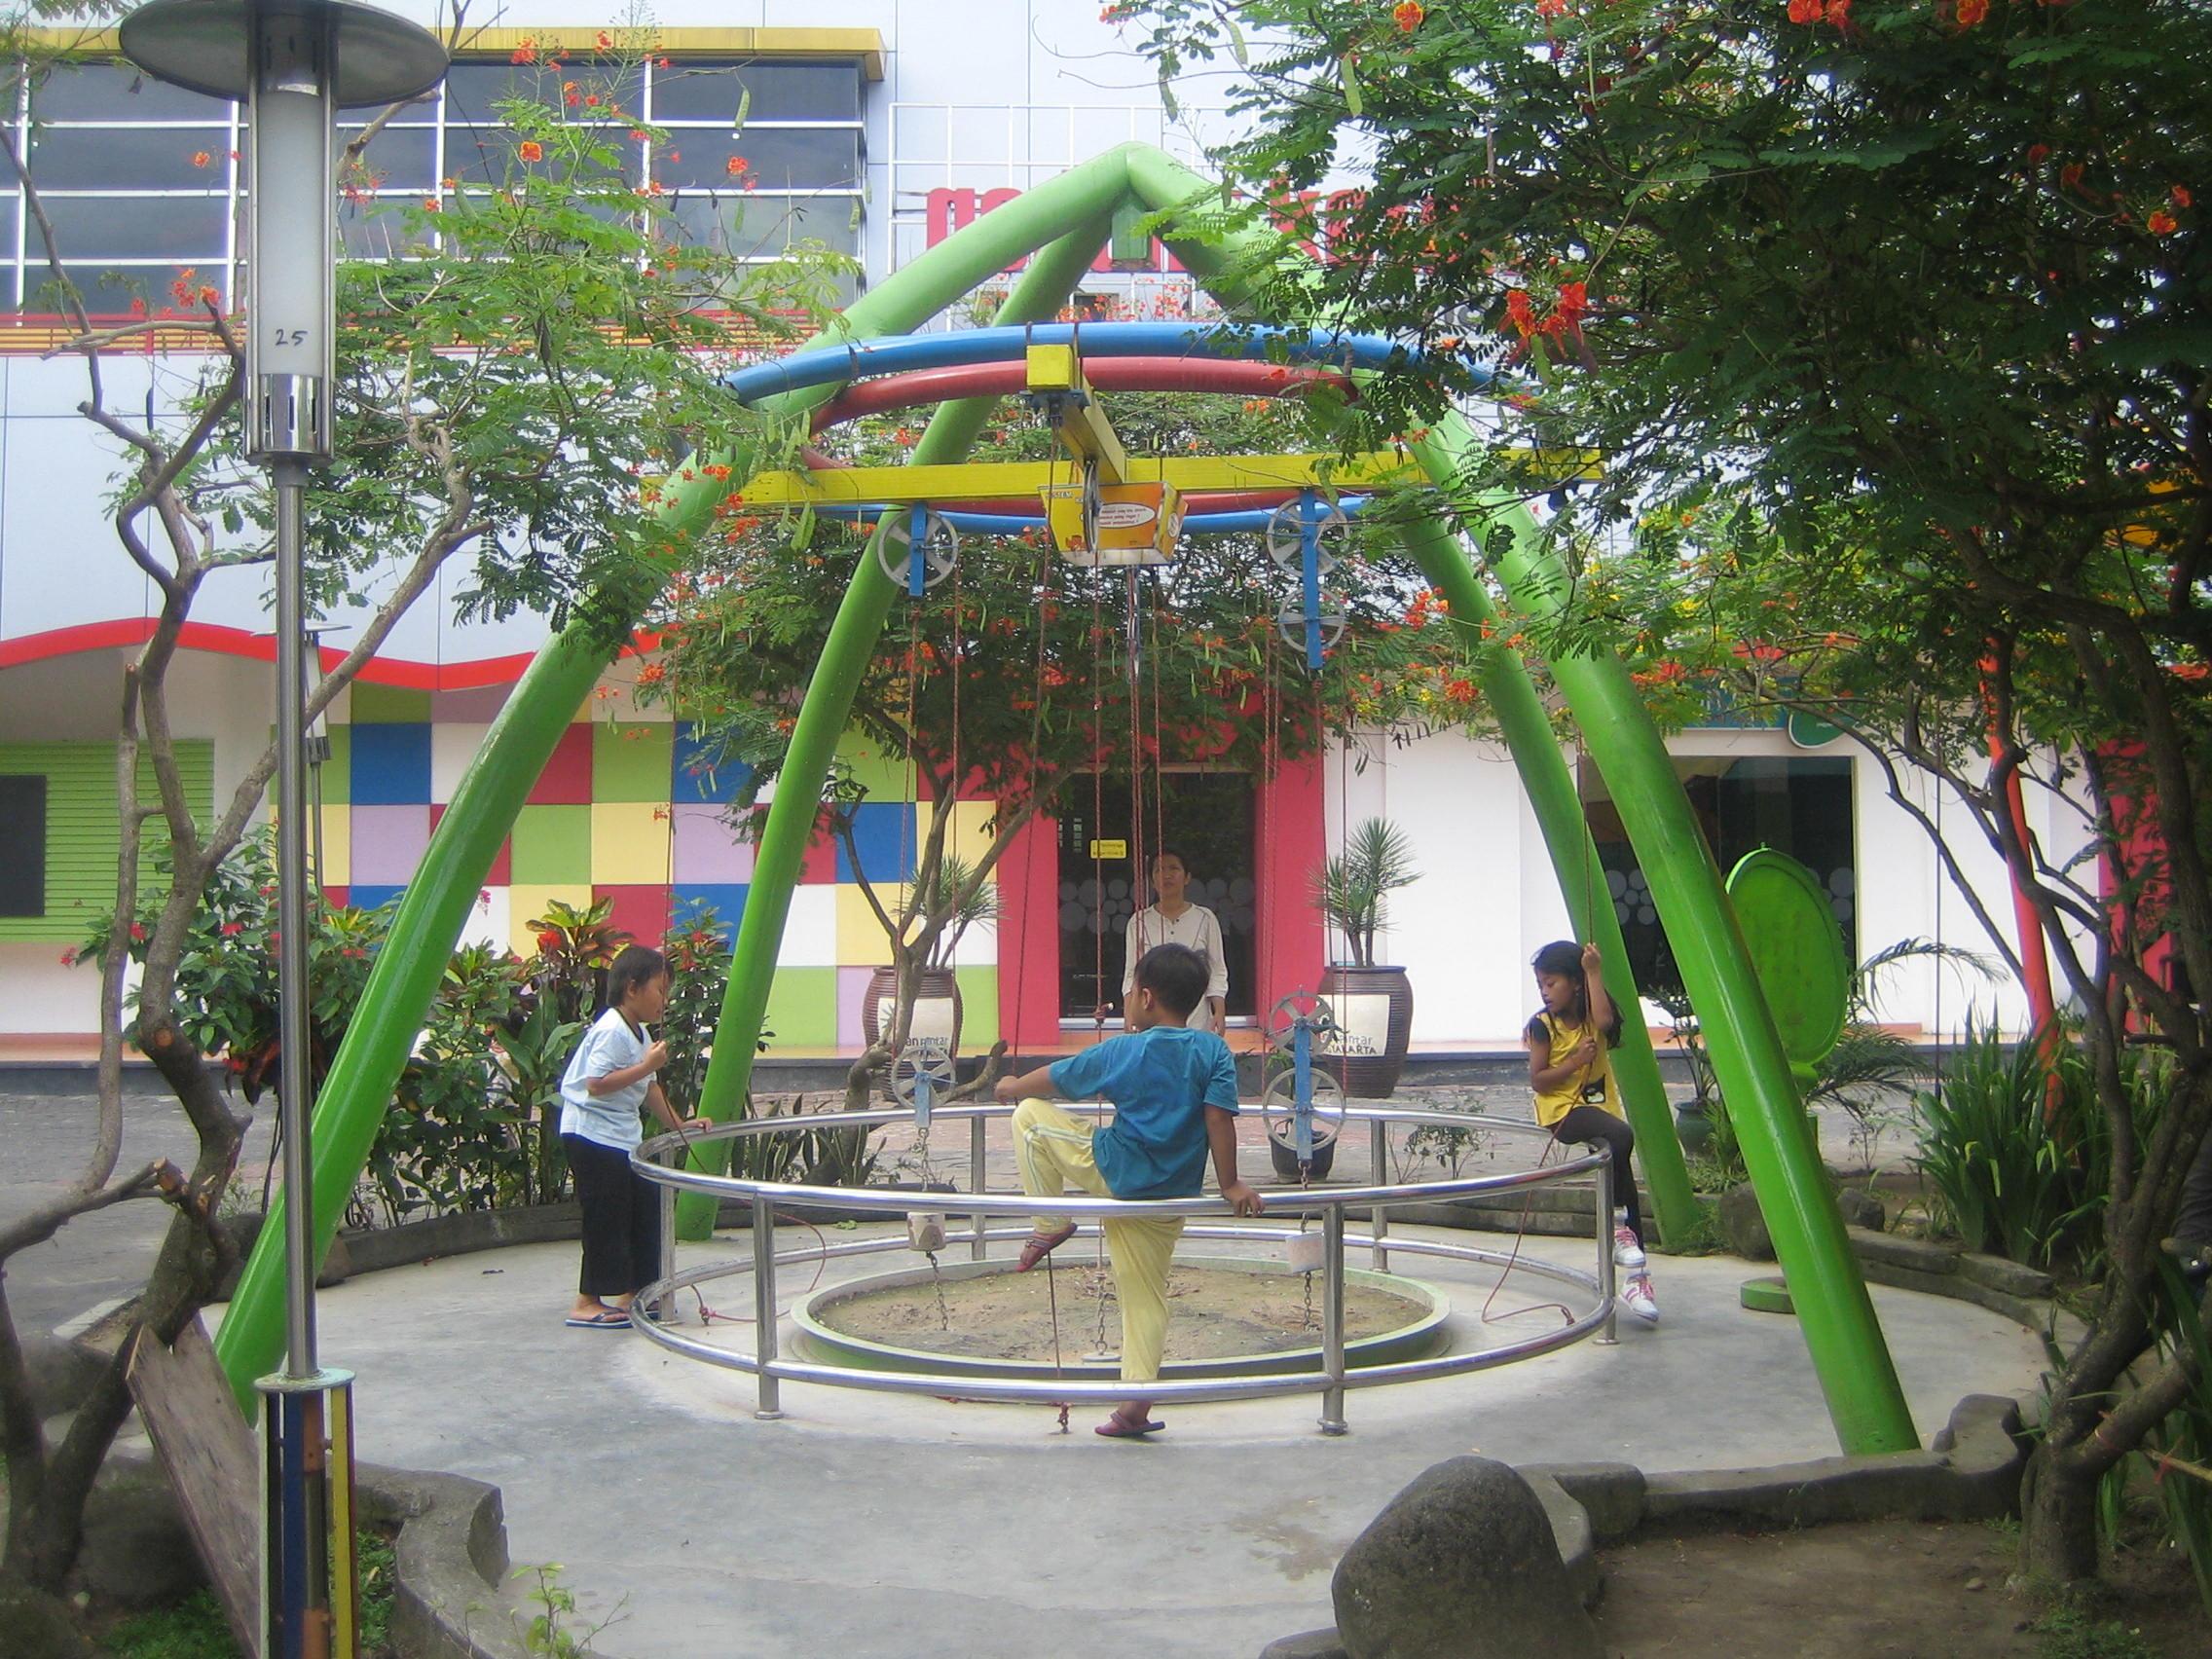 Wisata Taman Pintar Sewa Mobil Online Jogja Zona Permainan Yogyakarta